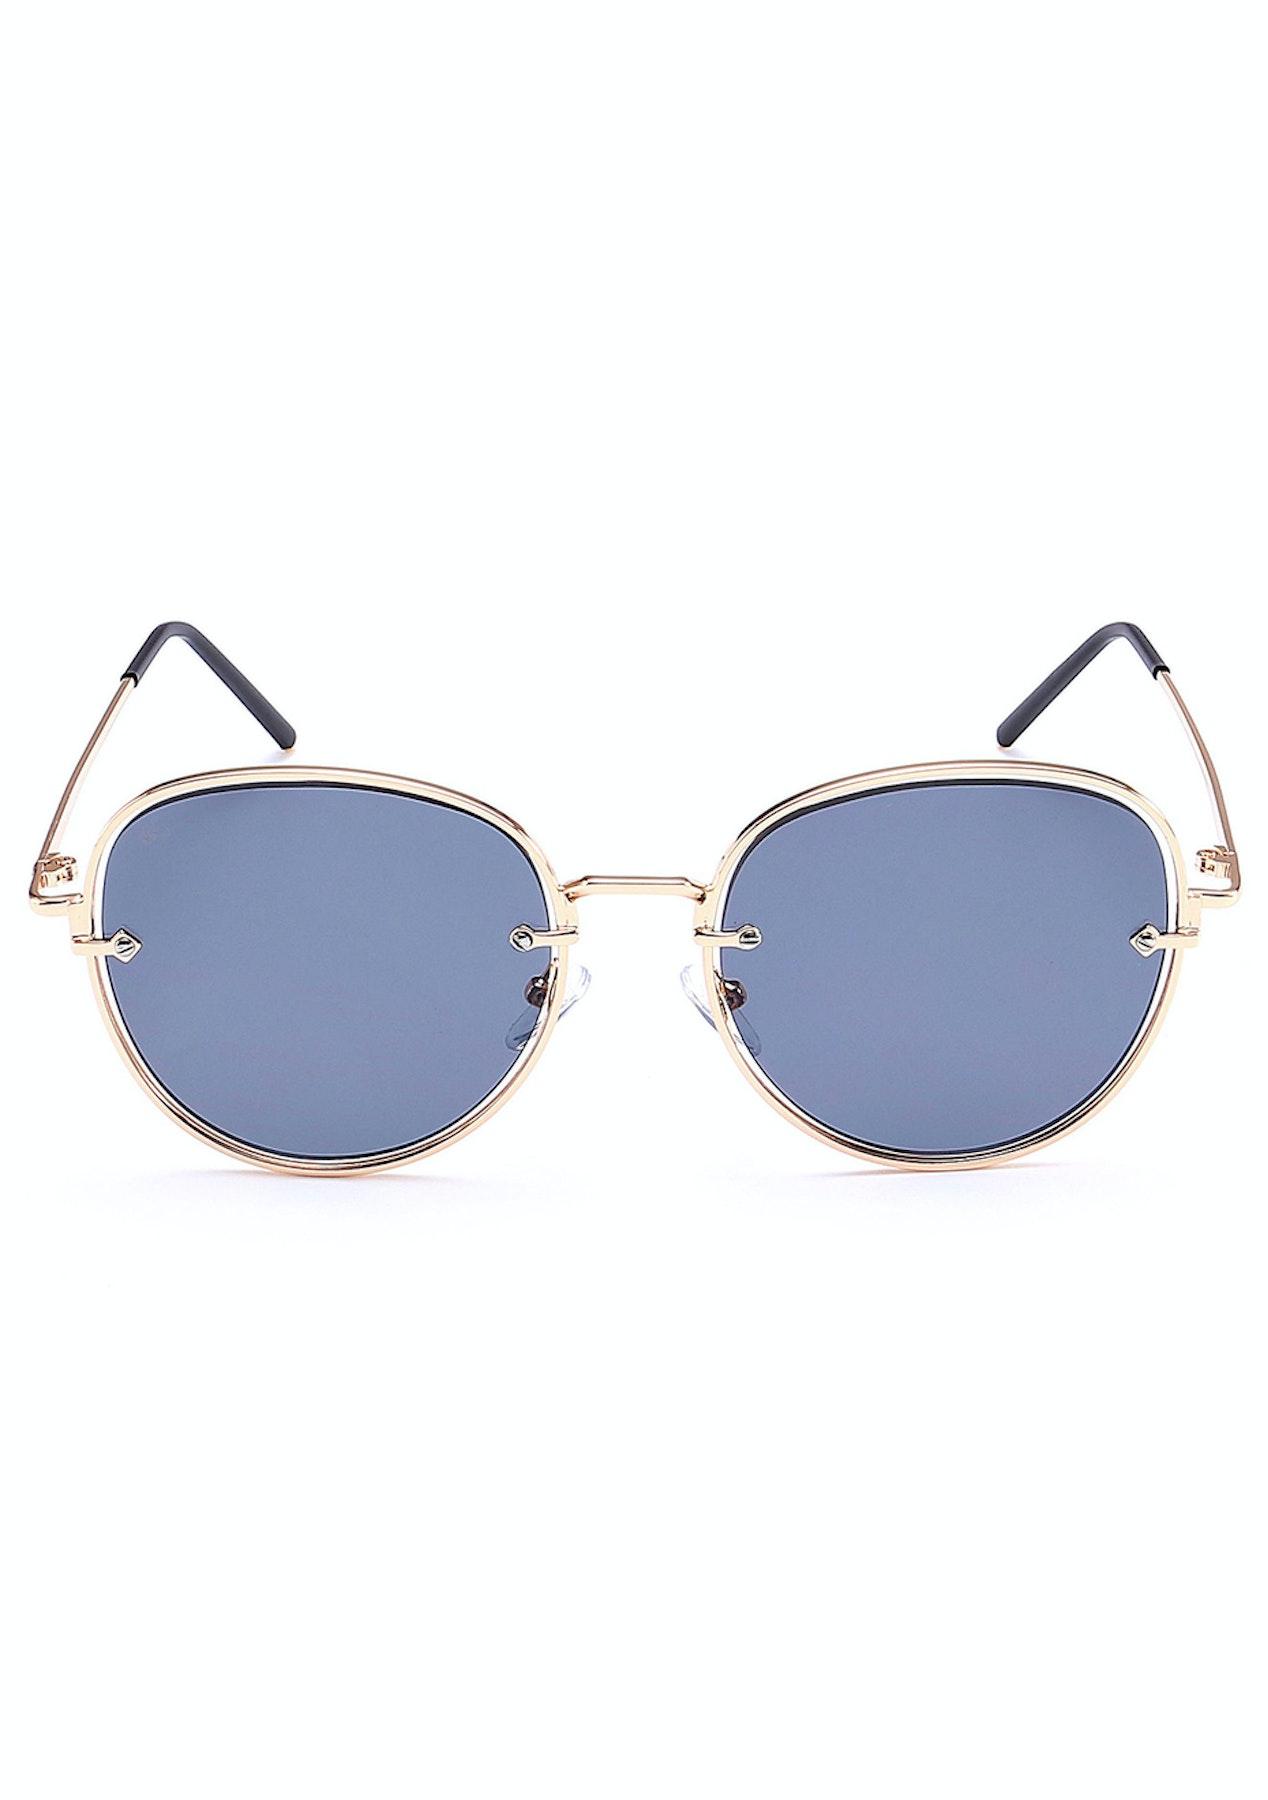 2f09cd28d4 Prive© Revaux The Escobar Sunglasses - Grey - Prive Revaux Sunglasses -  Onceit